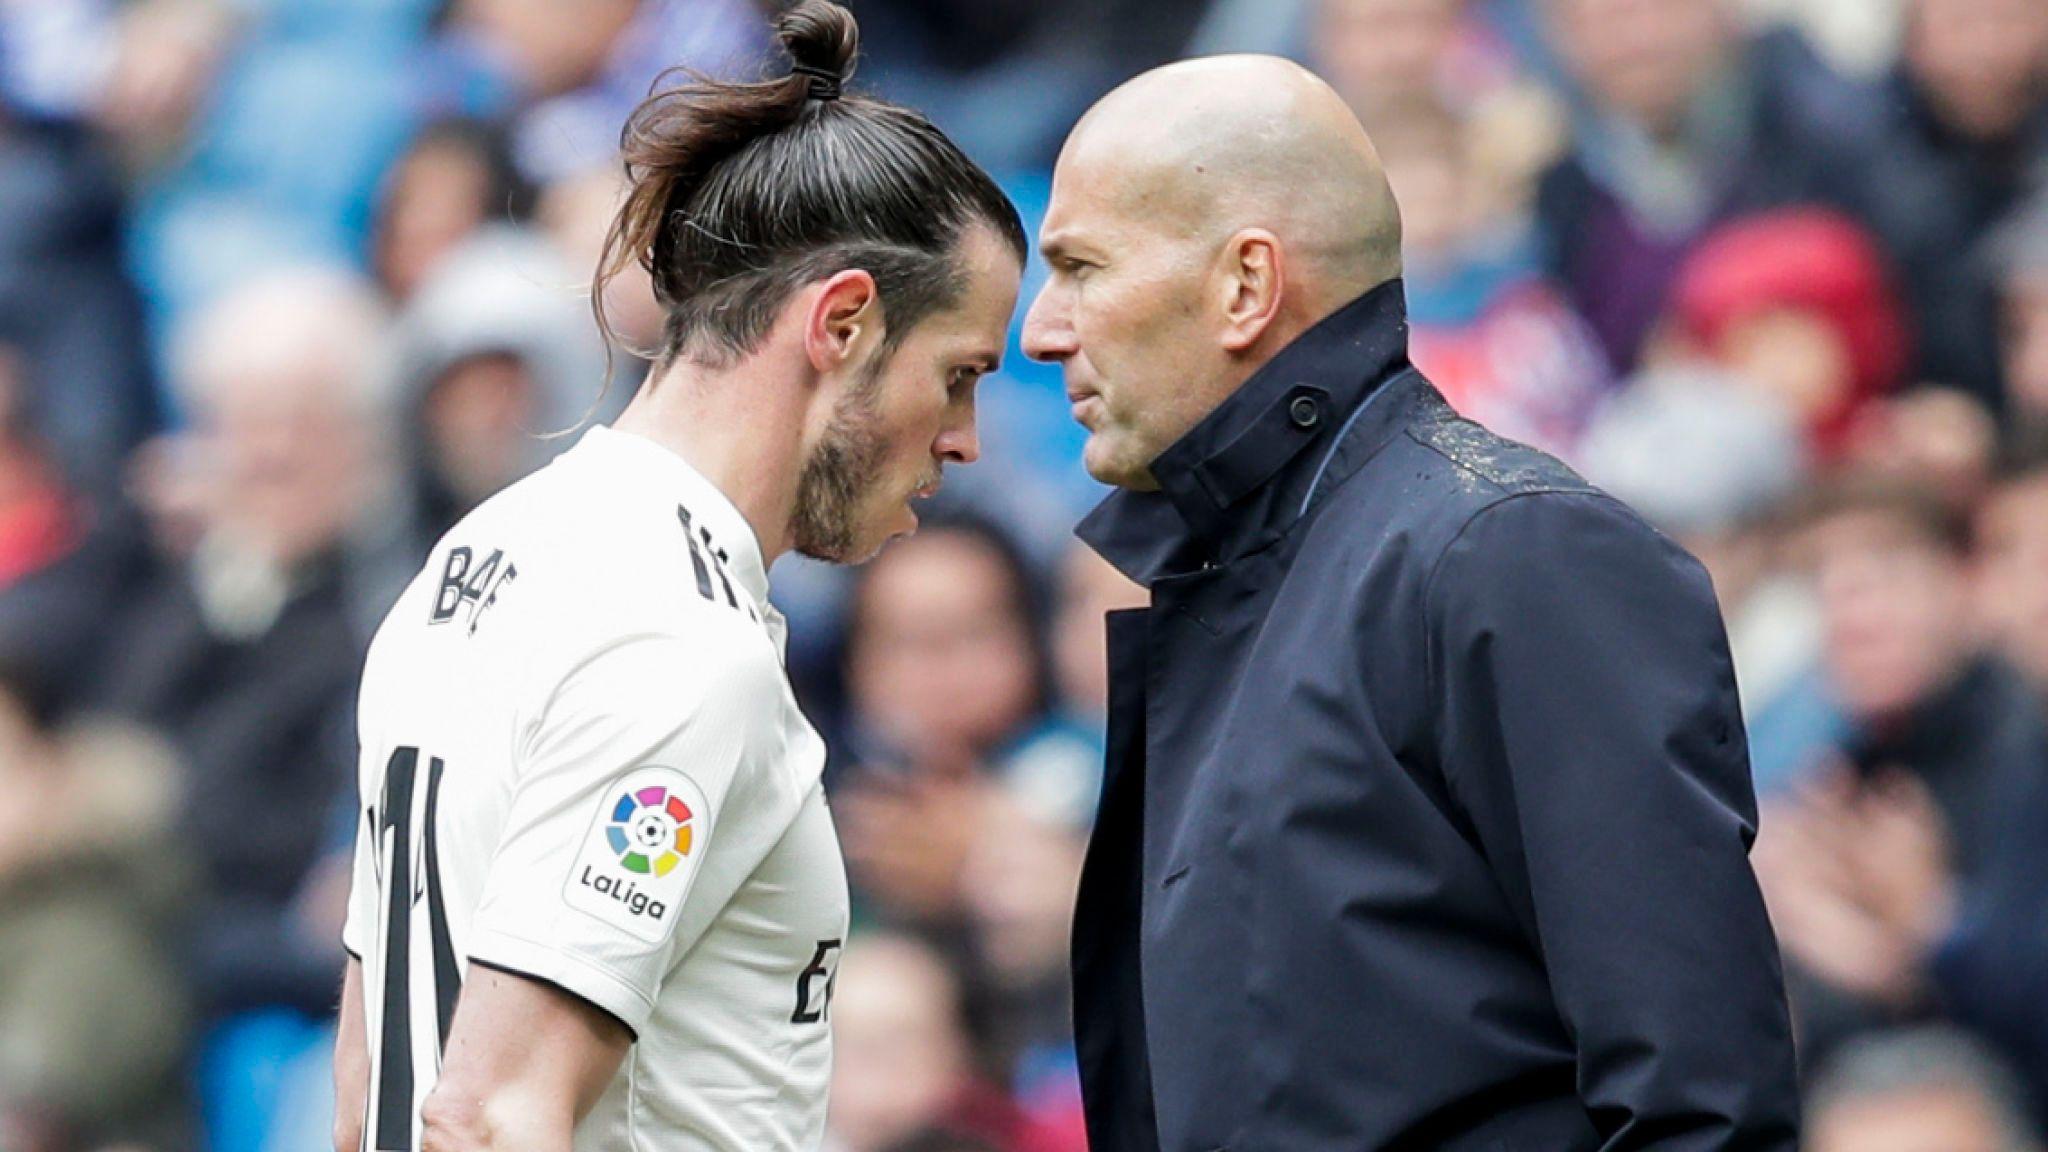 bale, Levy Kumbakiza Bale, Tottenham?, Meridianbet